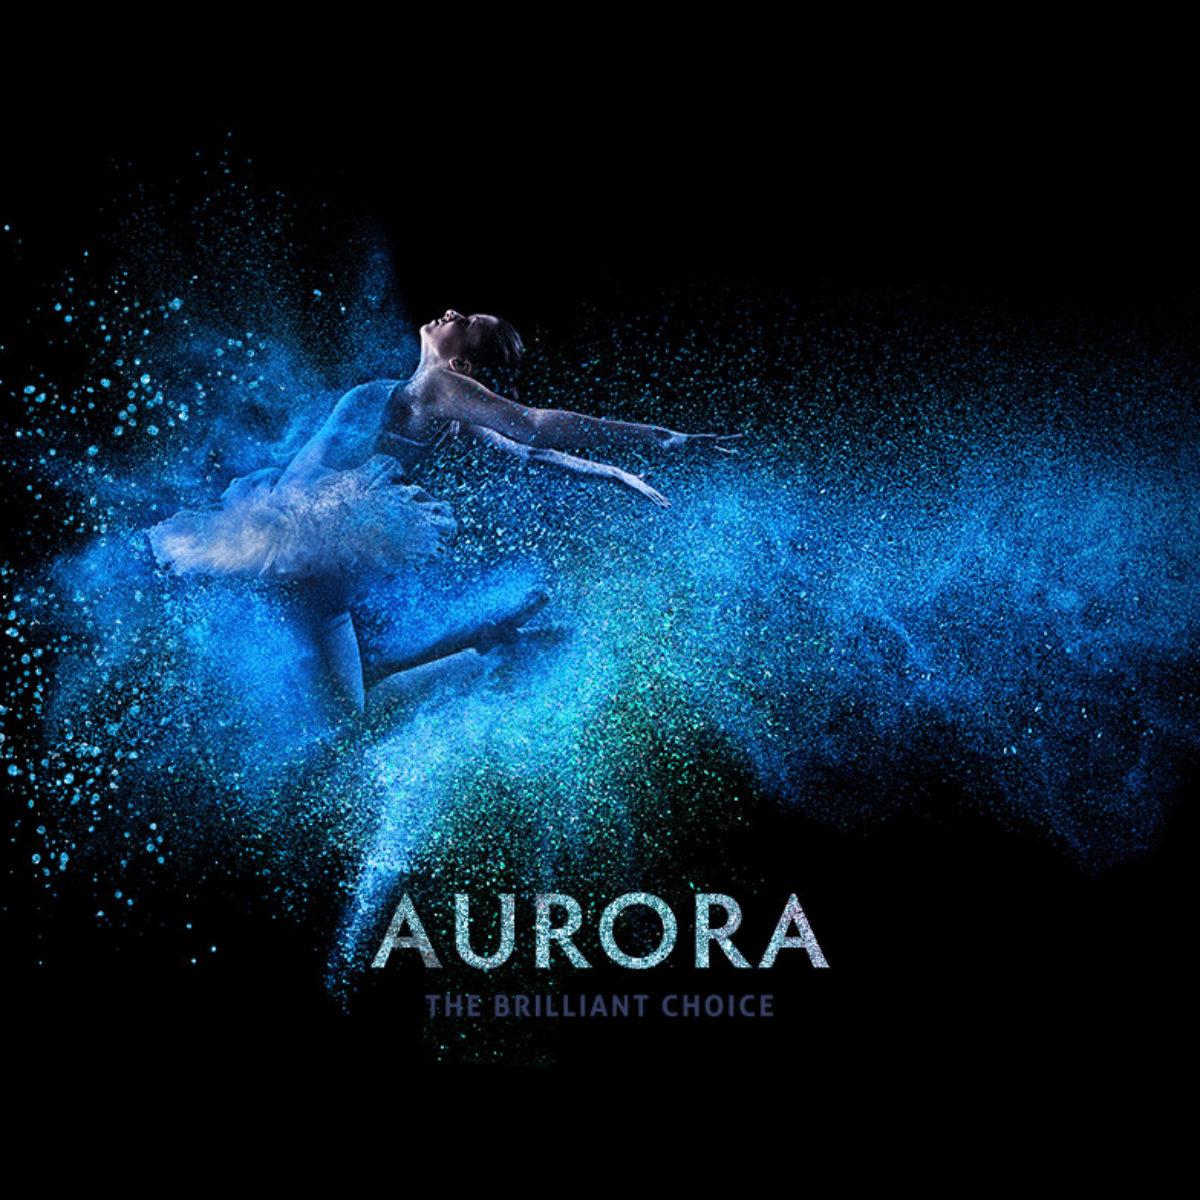 Aurora – The Brilliant Choice